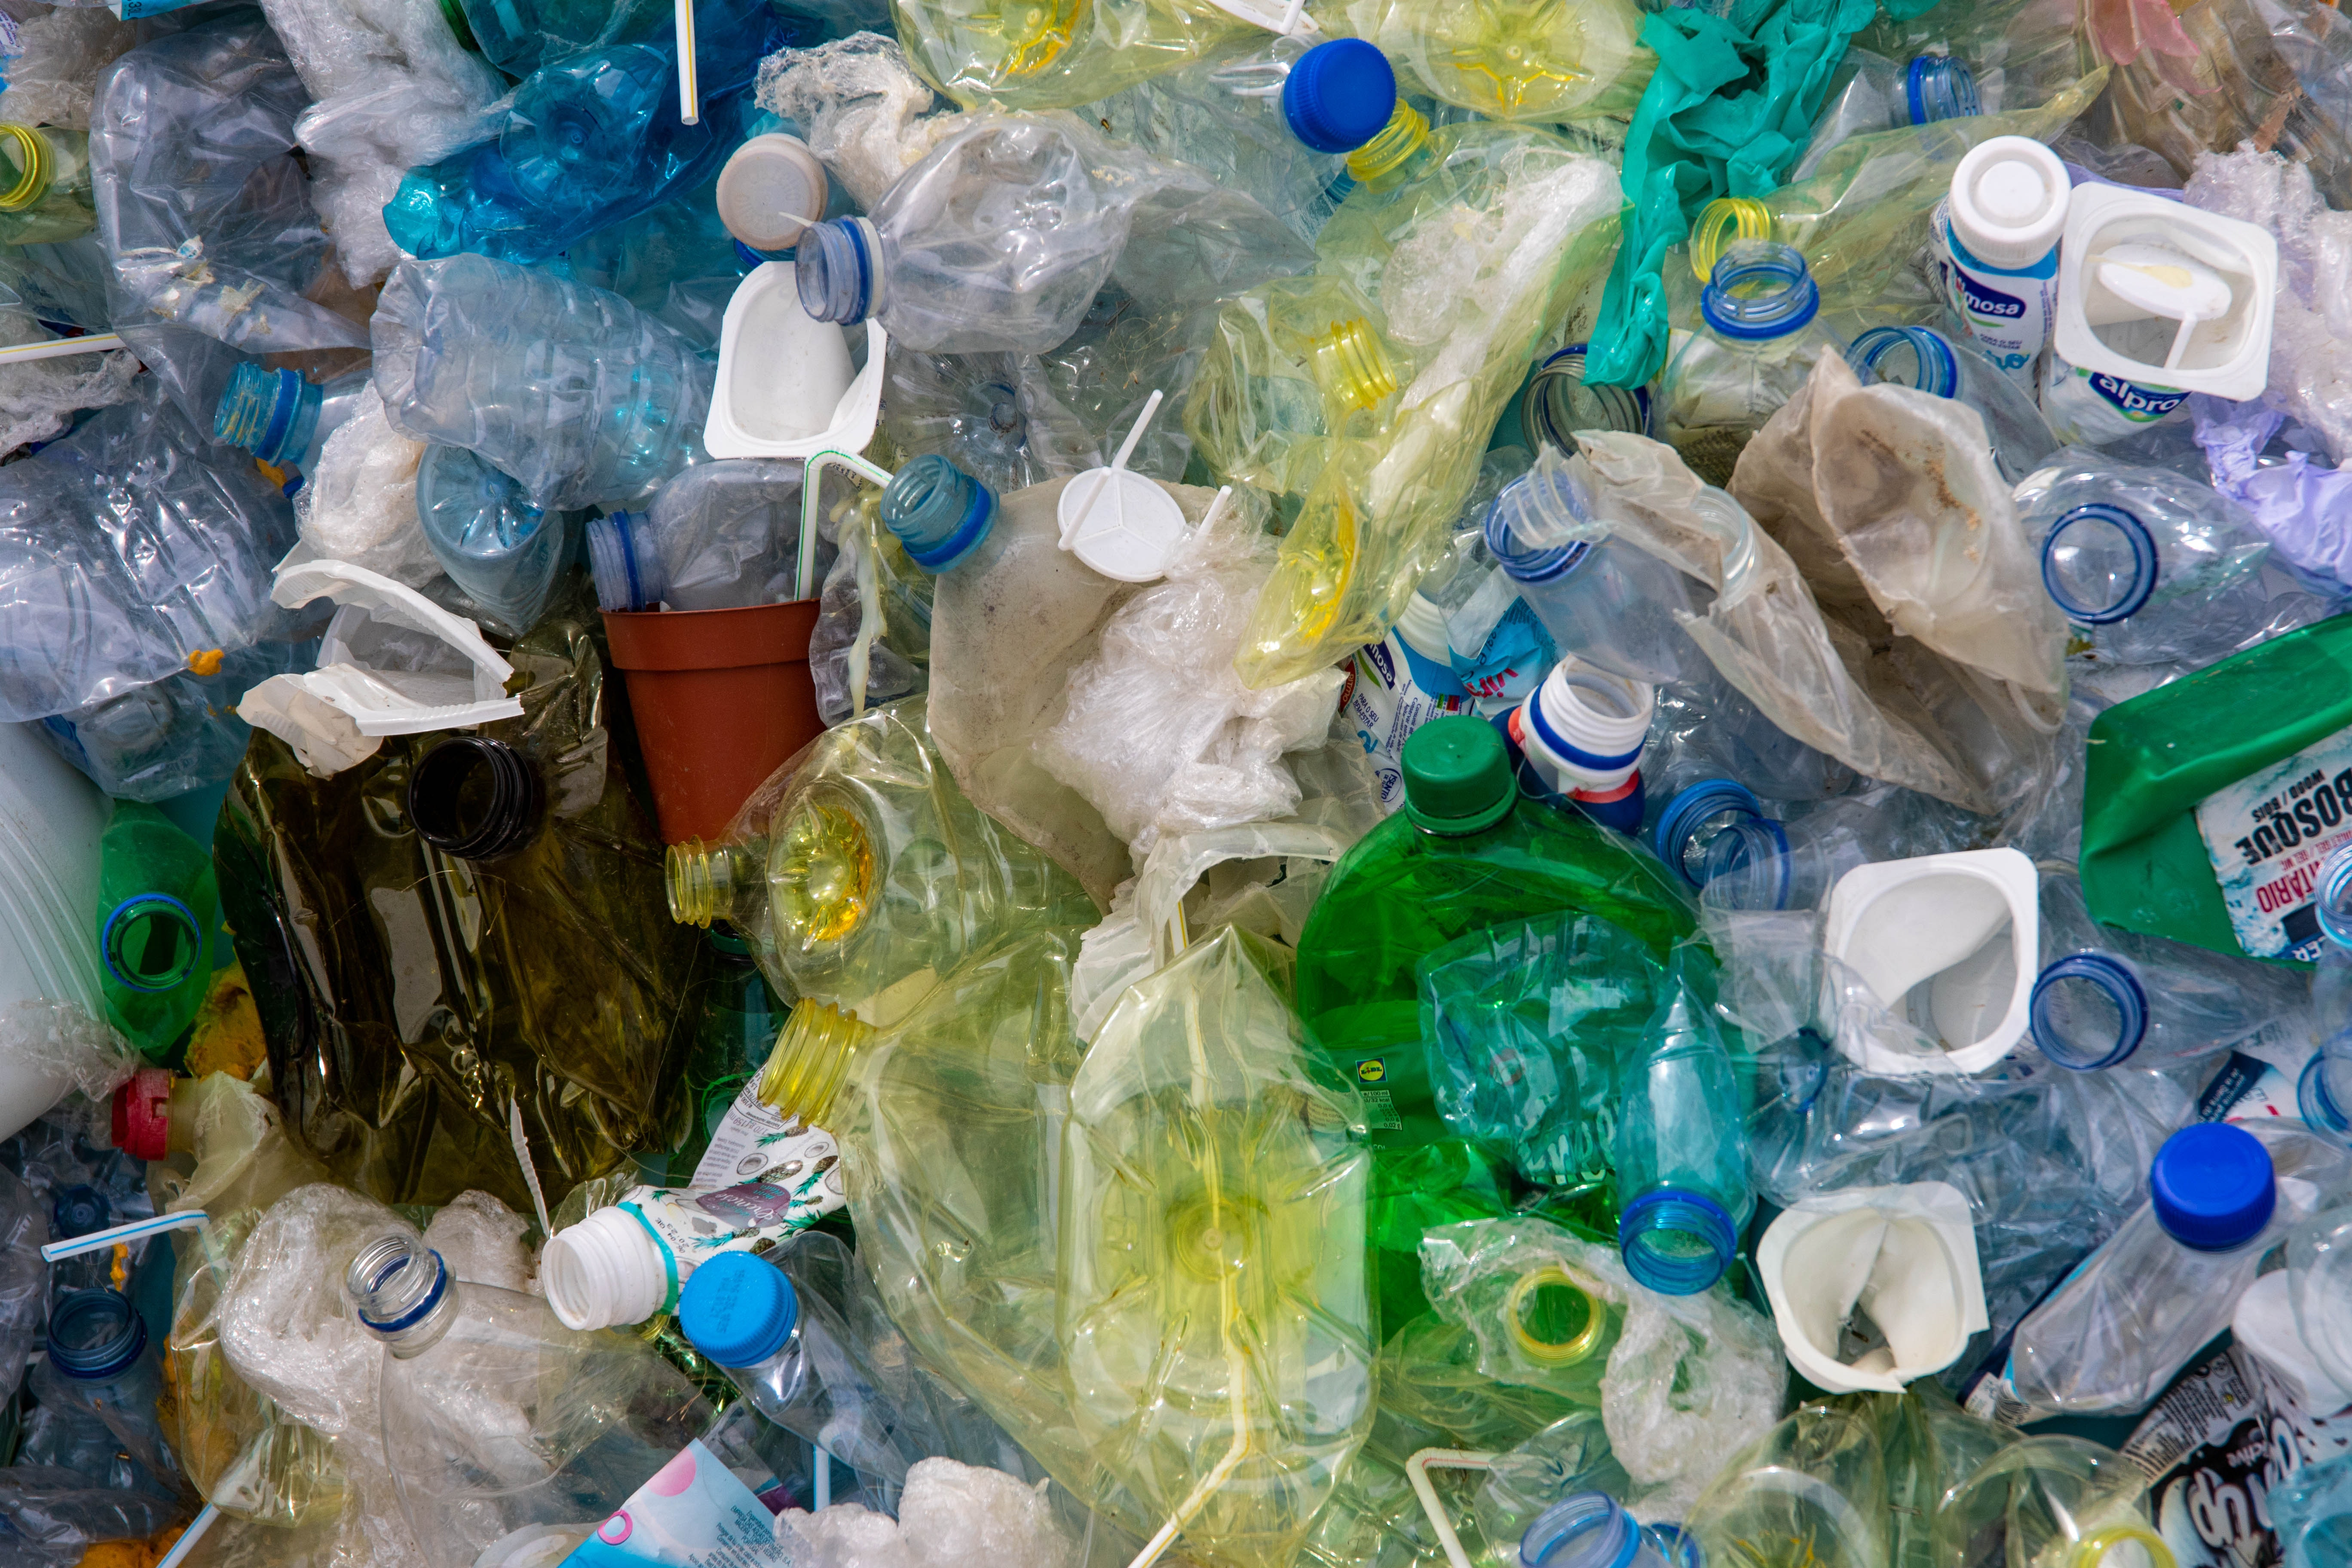 https://www.ssrana.in/wp-content/uploads/2019/09/Plastic-Ban-final-publication.jpg